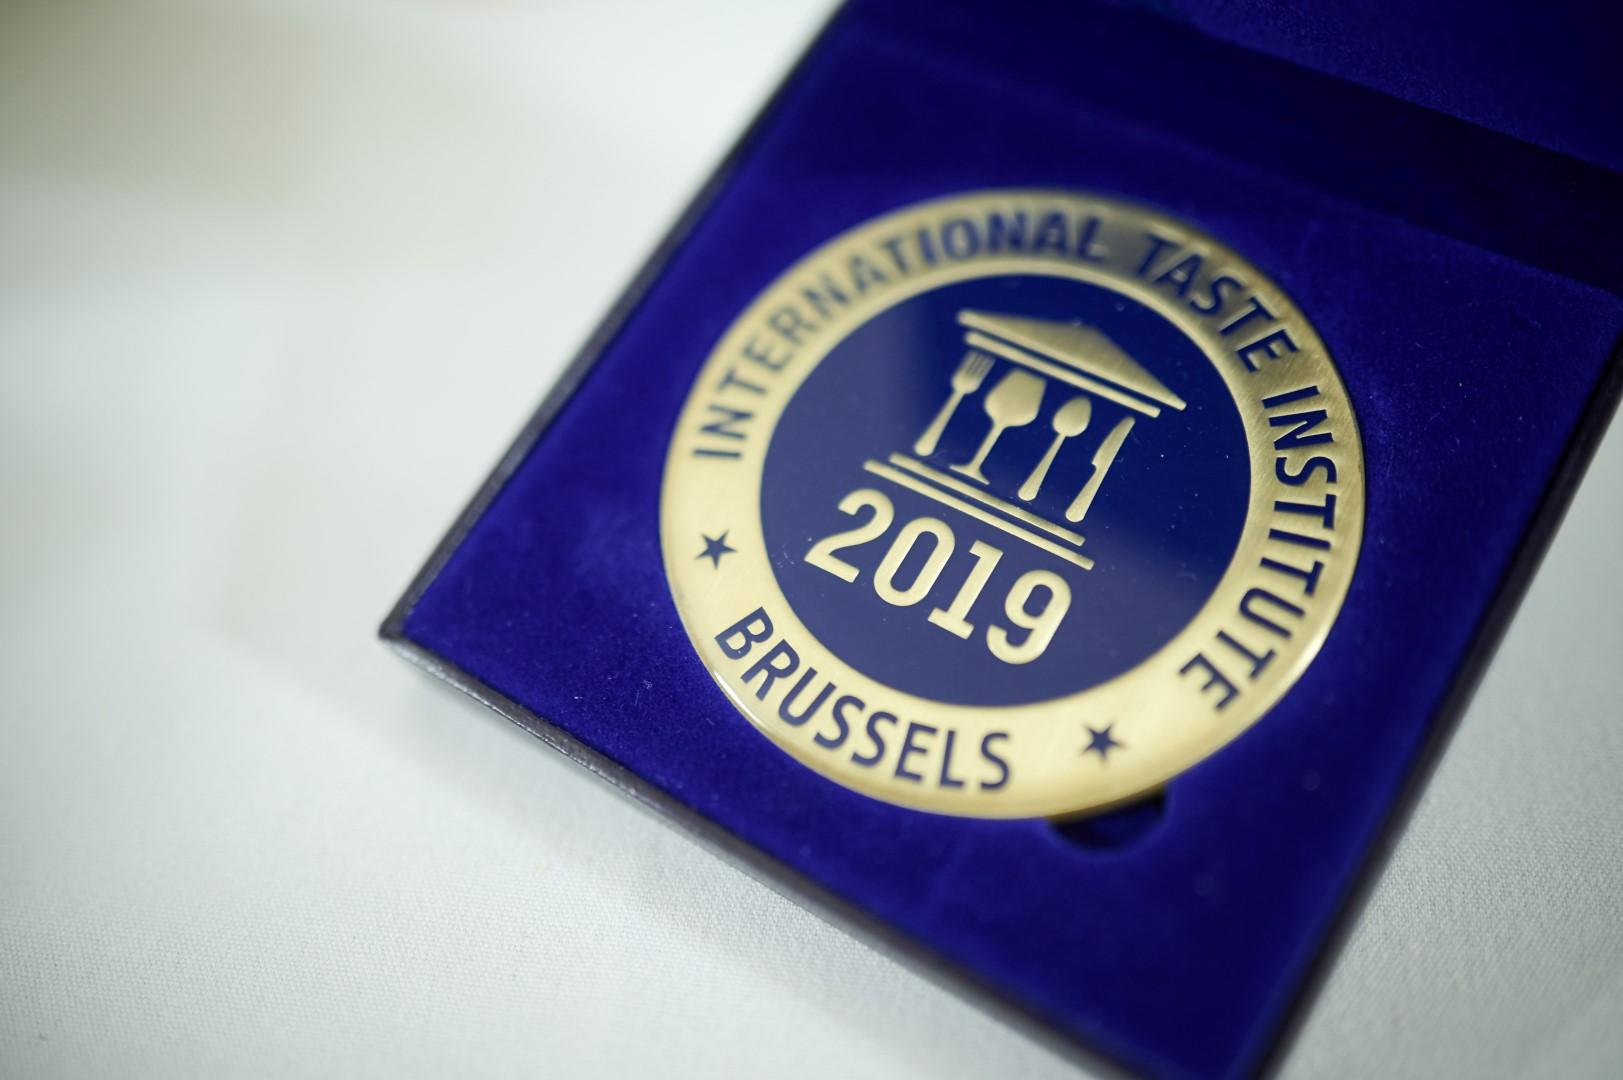 sirop românesc certificat internațional